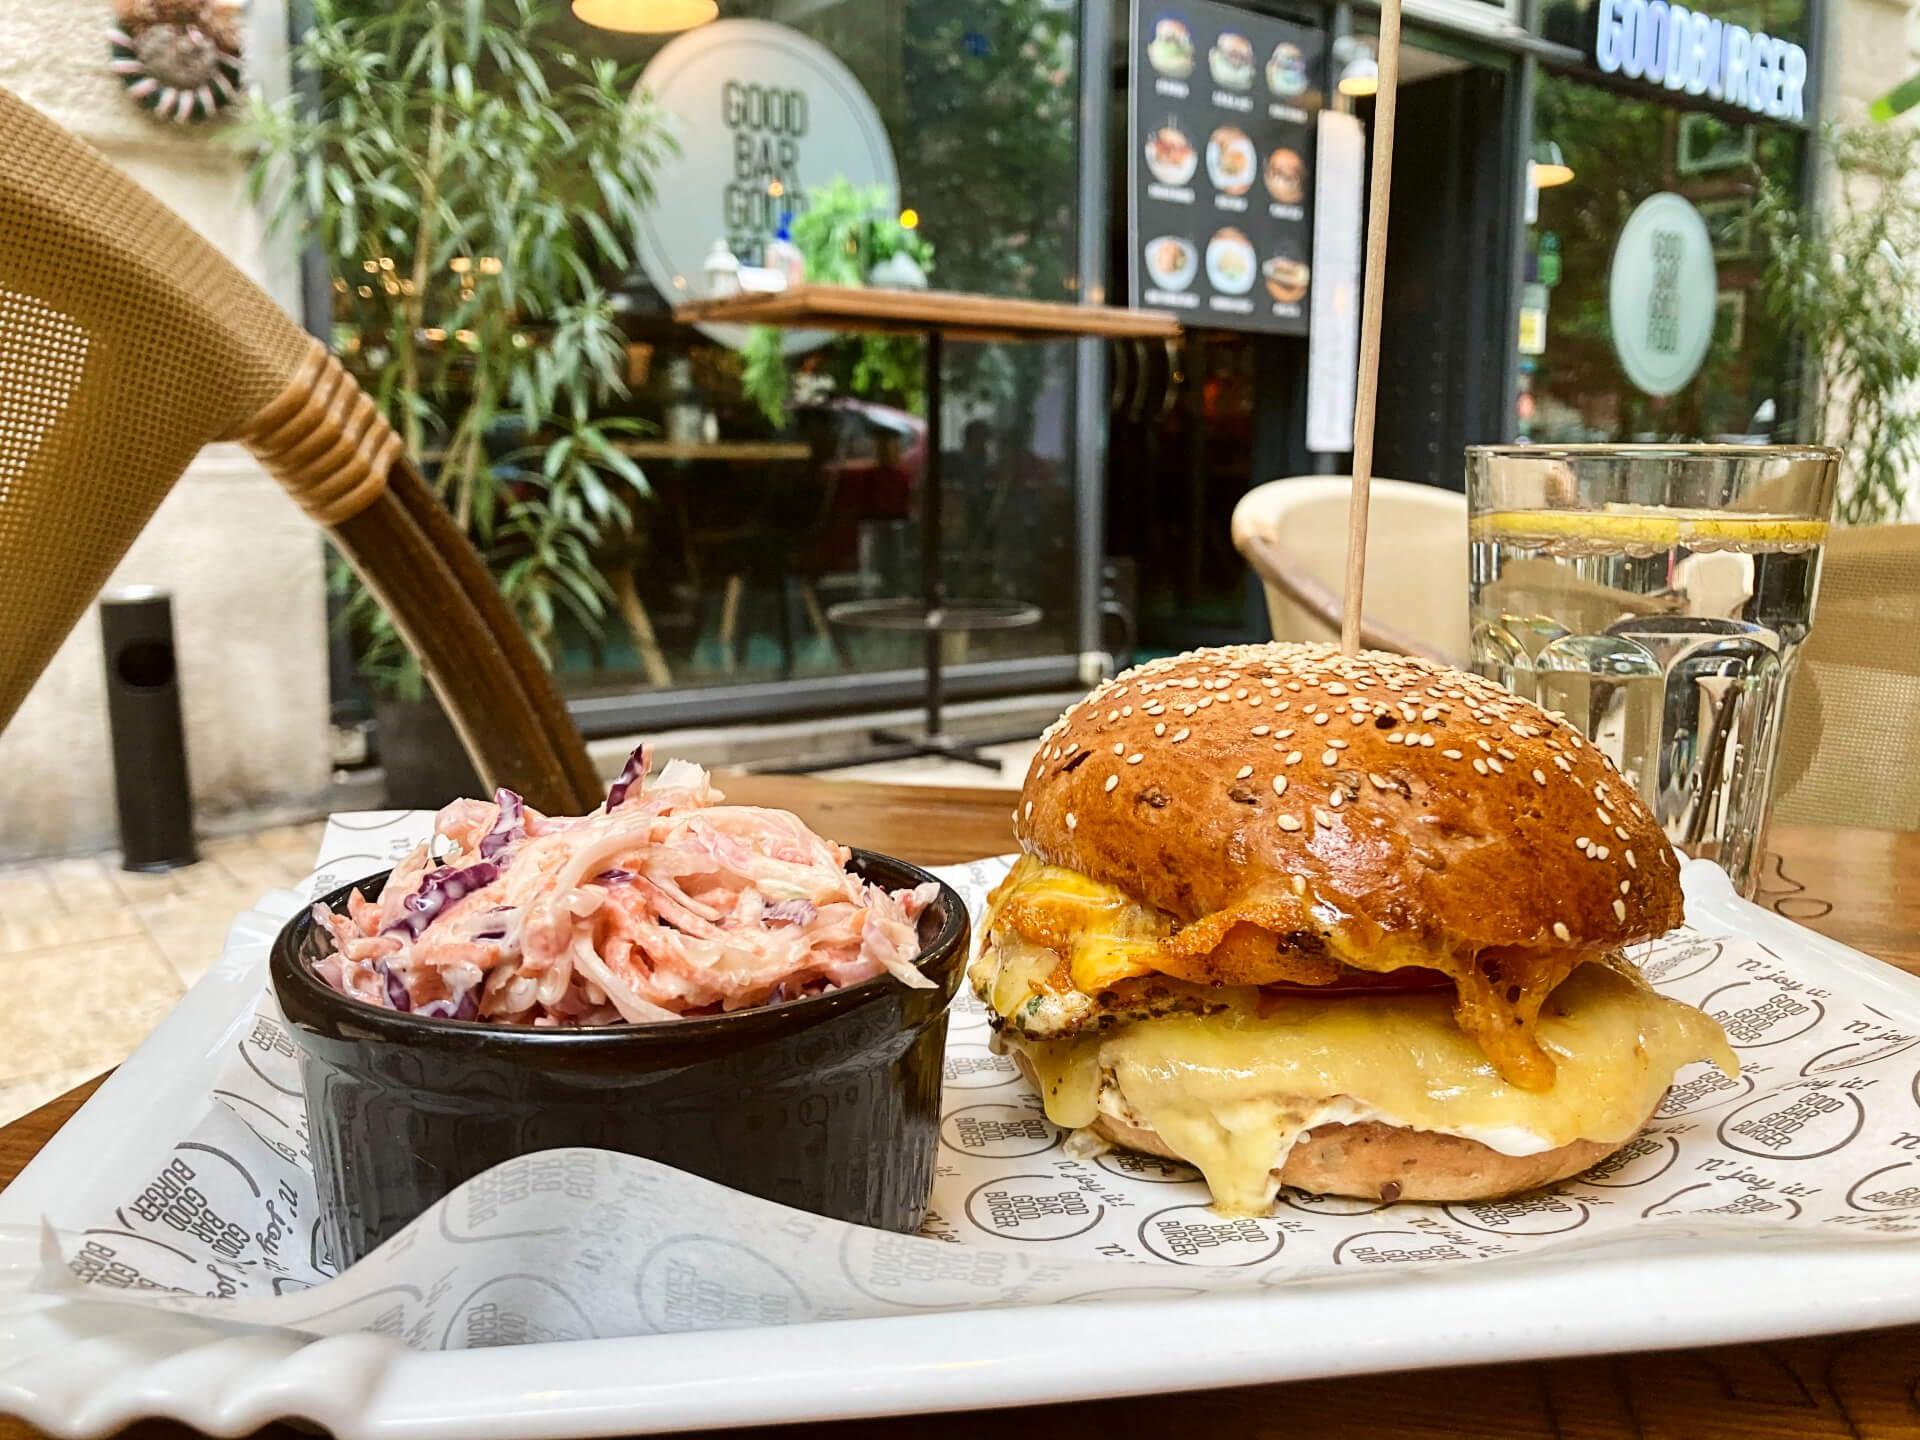 Goodbar csirkeburger